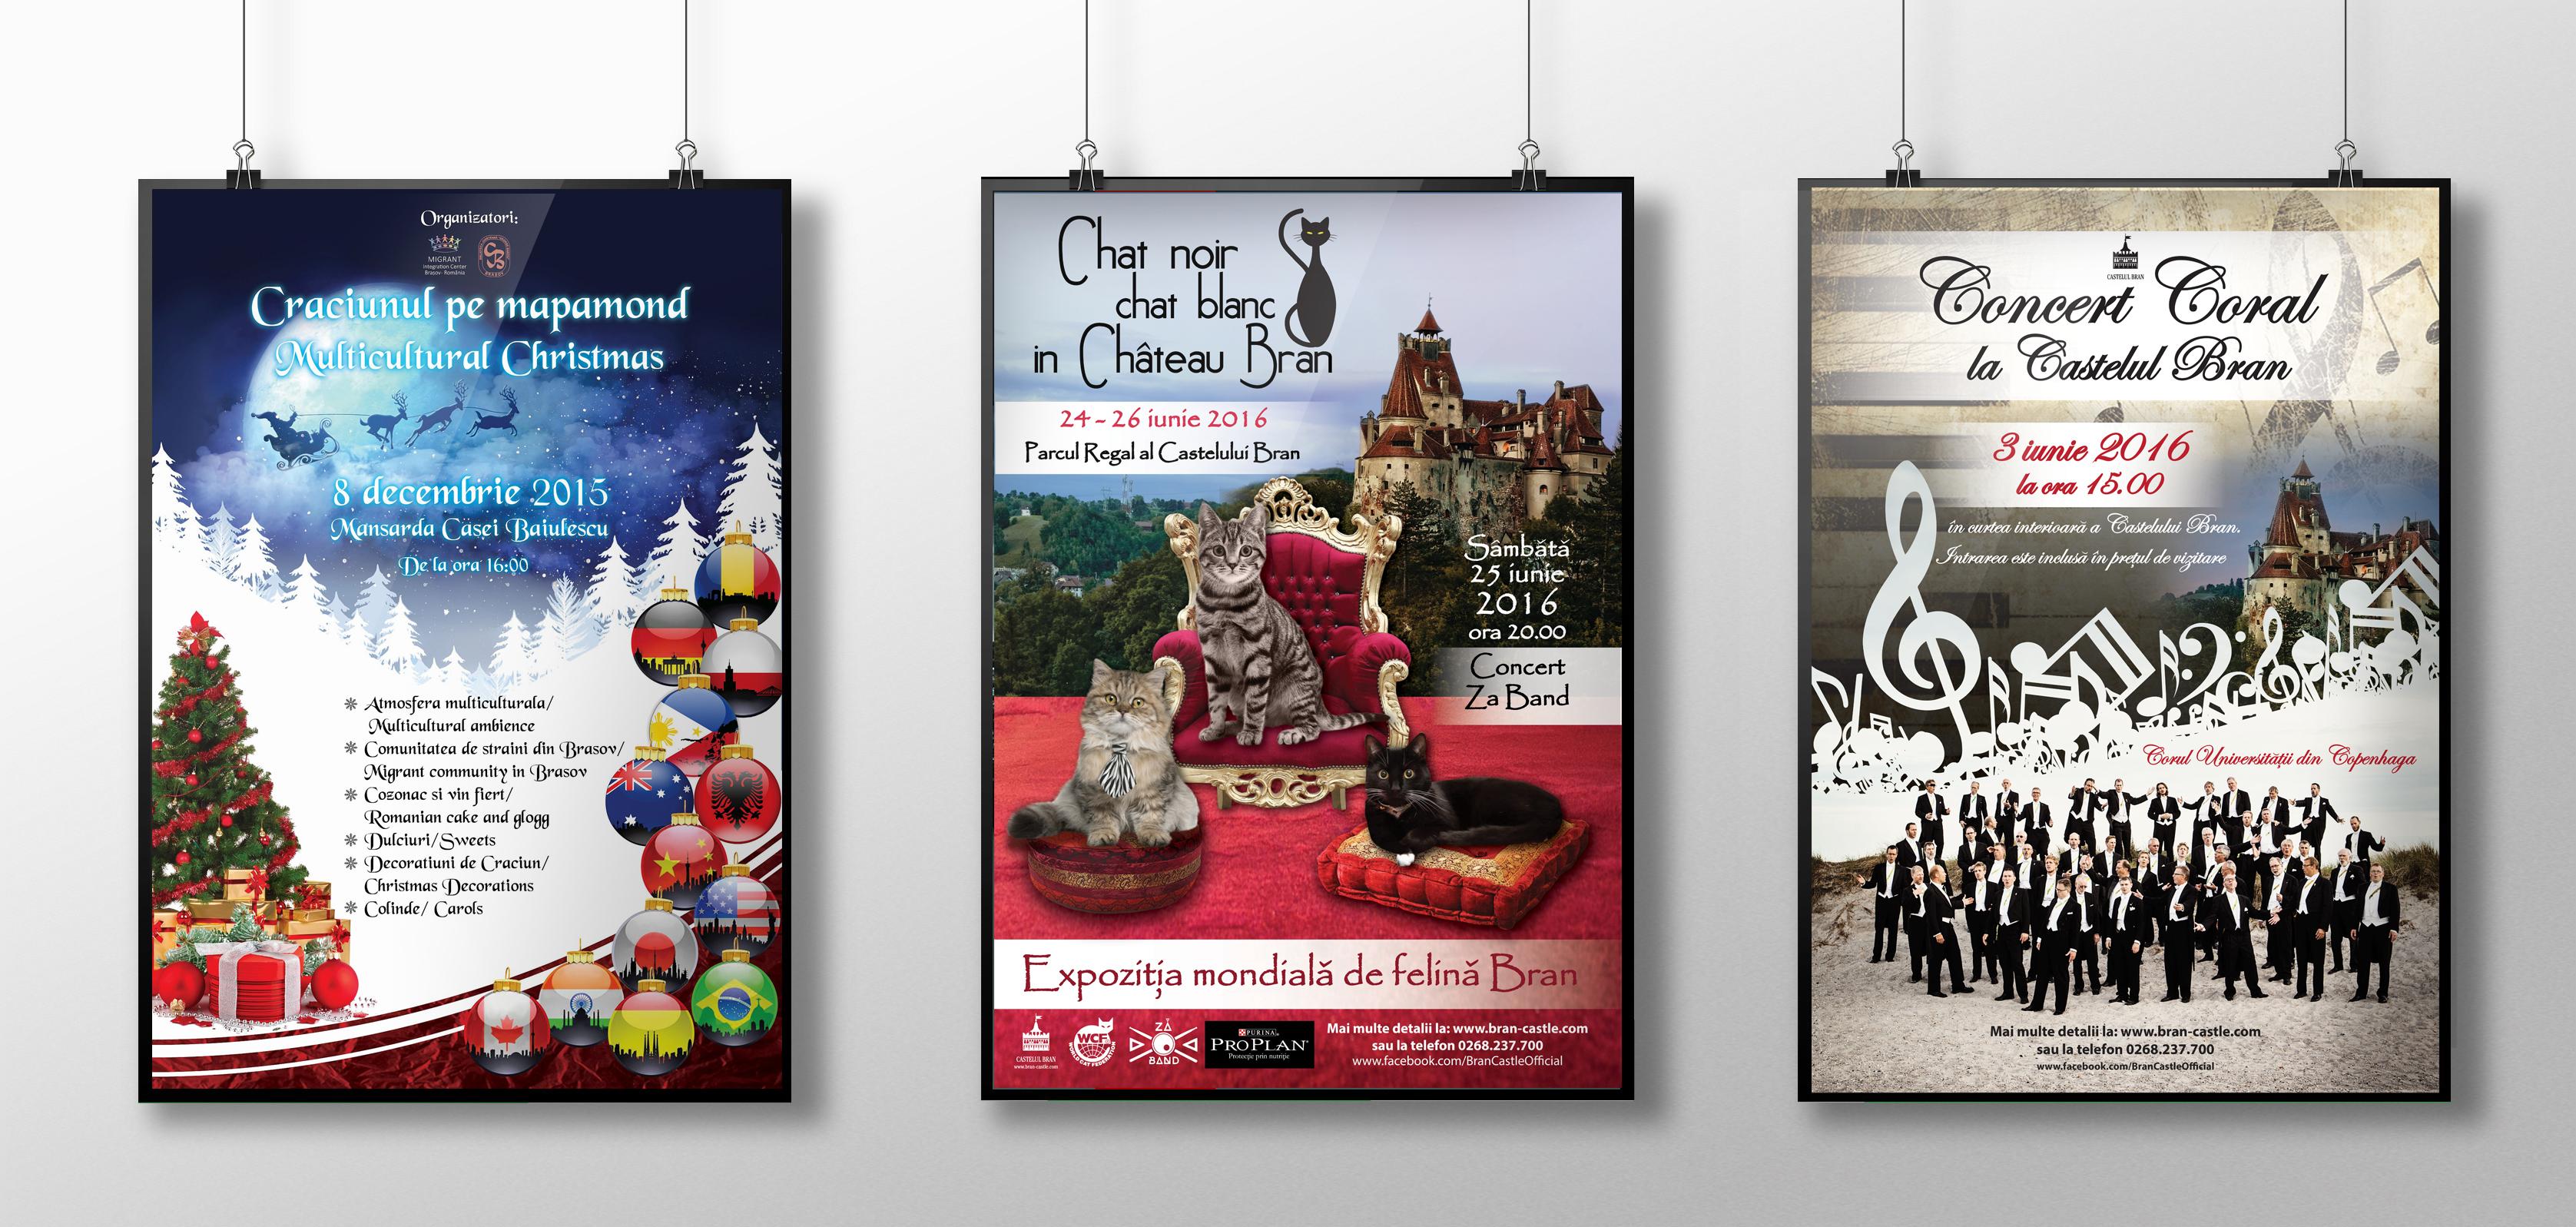 posters samples